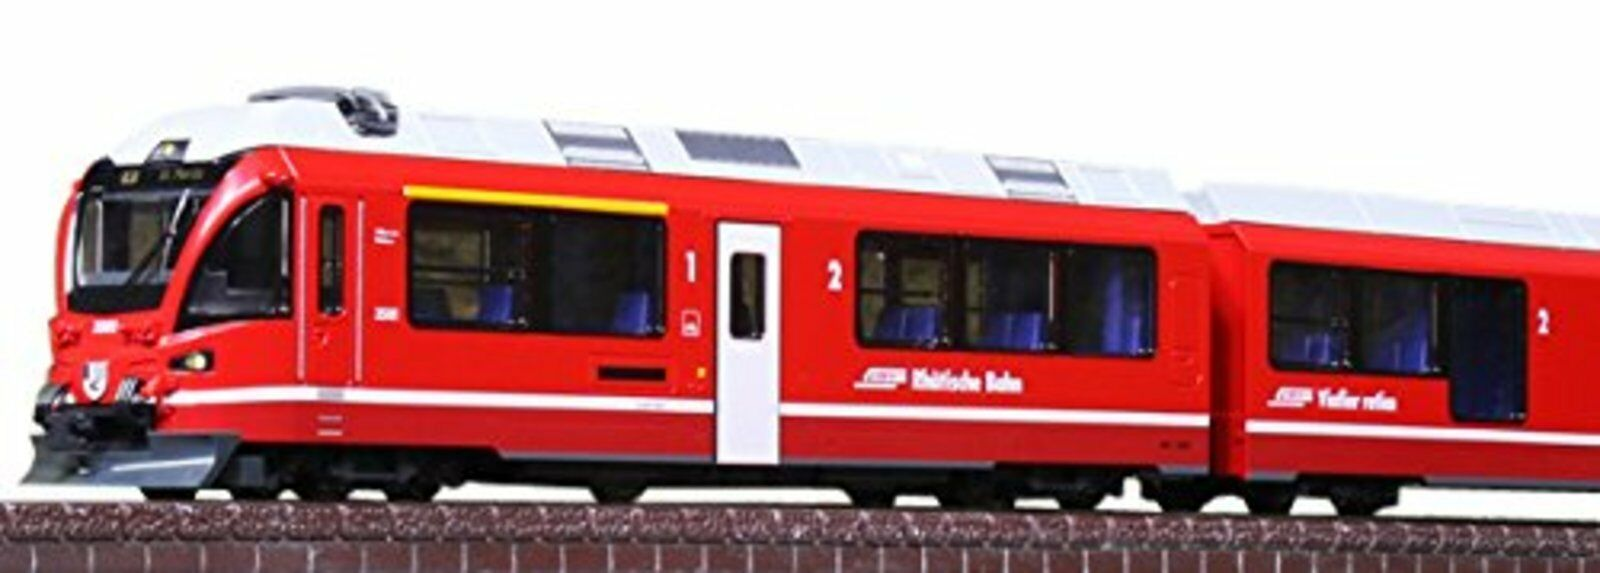 Kato 10-1318 Rhatische Bahn Bernina Express Básico 5-Coche Set Escala N F S W